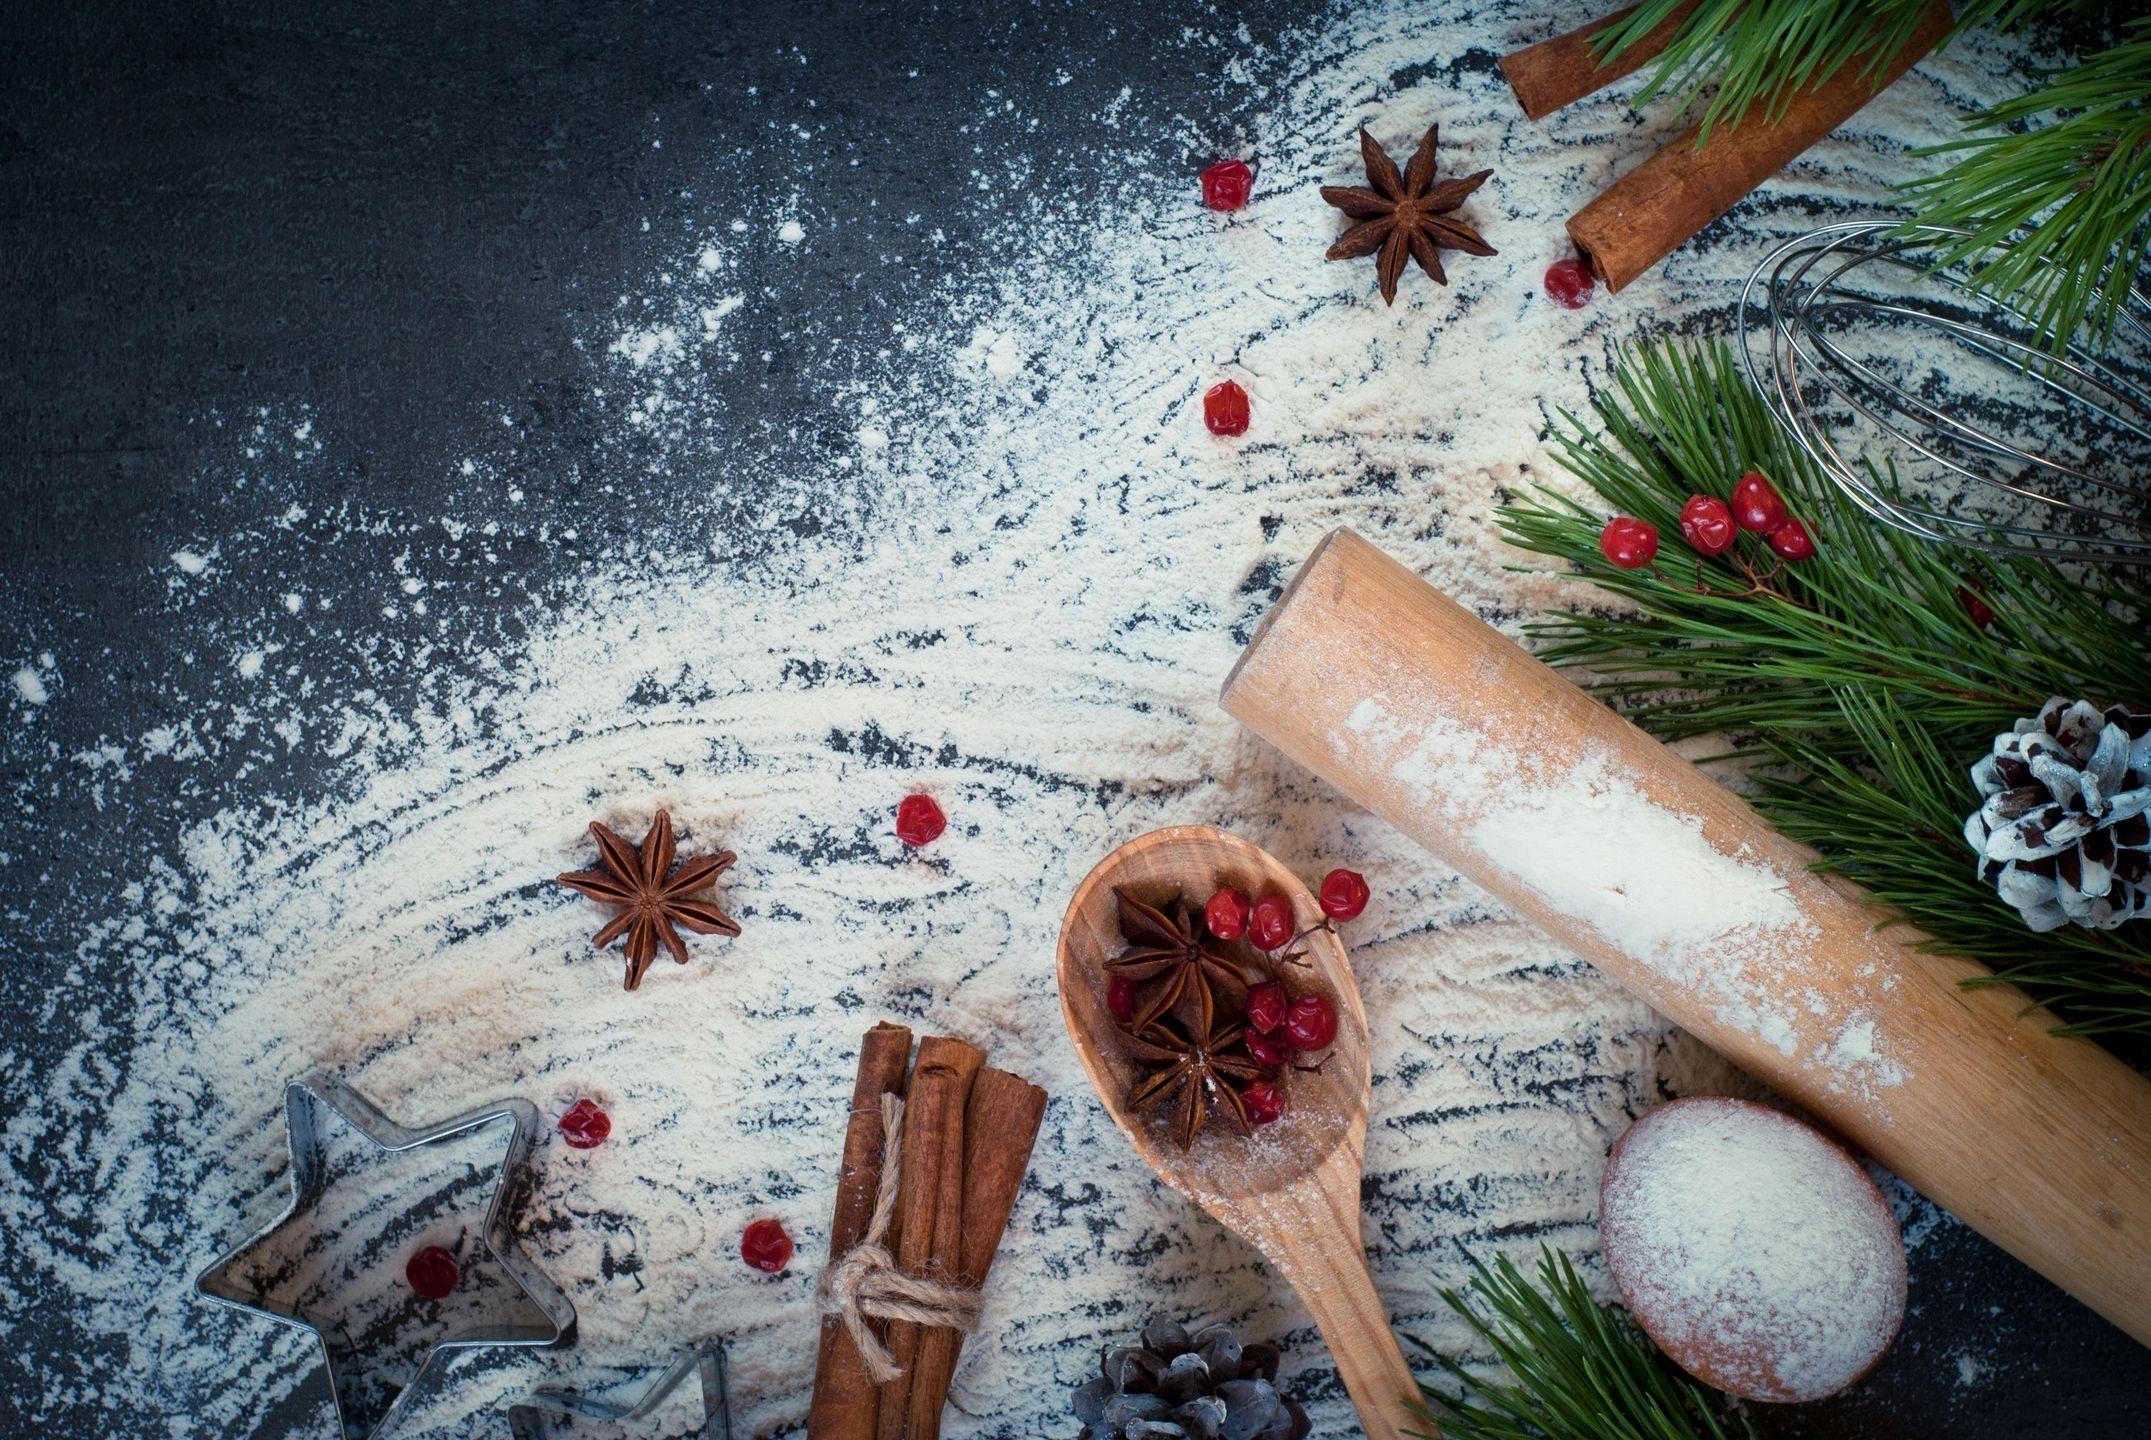 Holiday, dairy-free, egg nog, christmas, nutrition, health